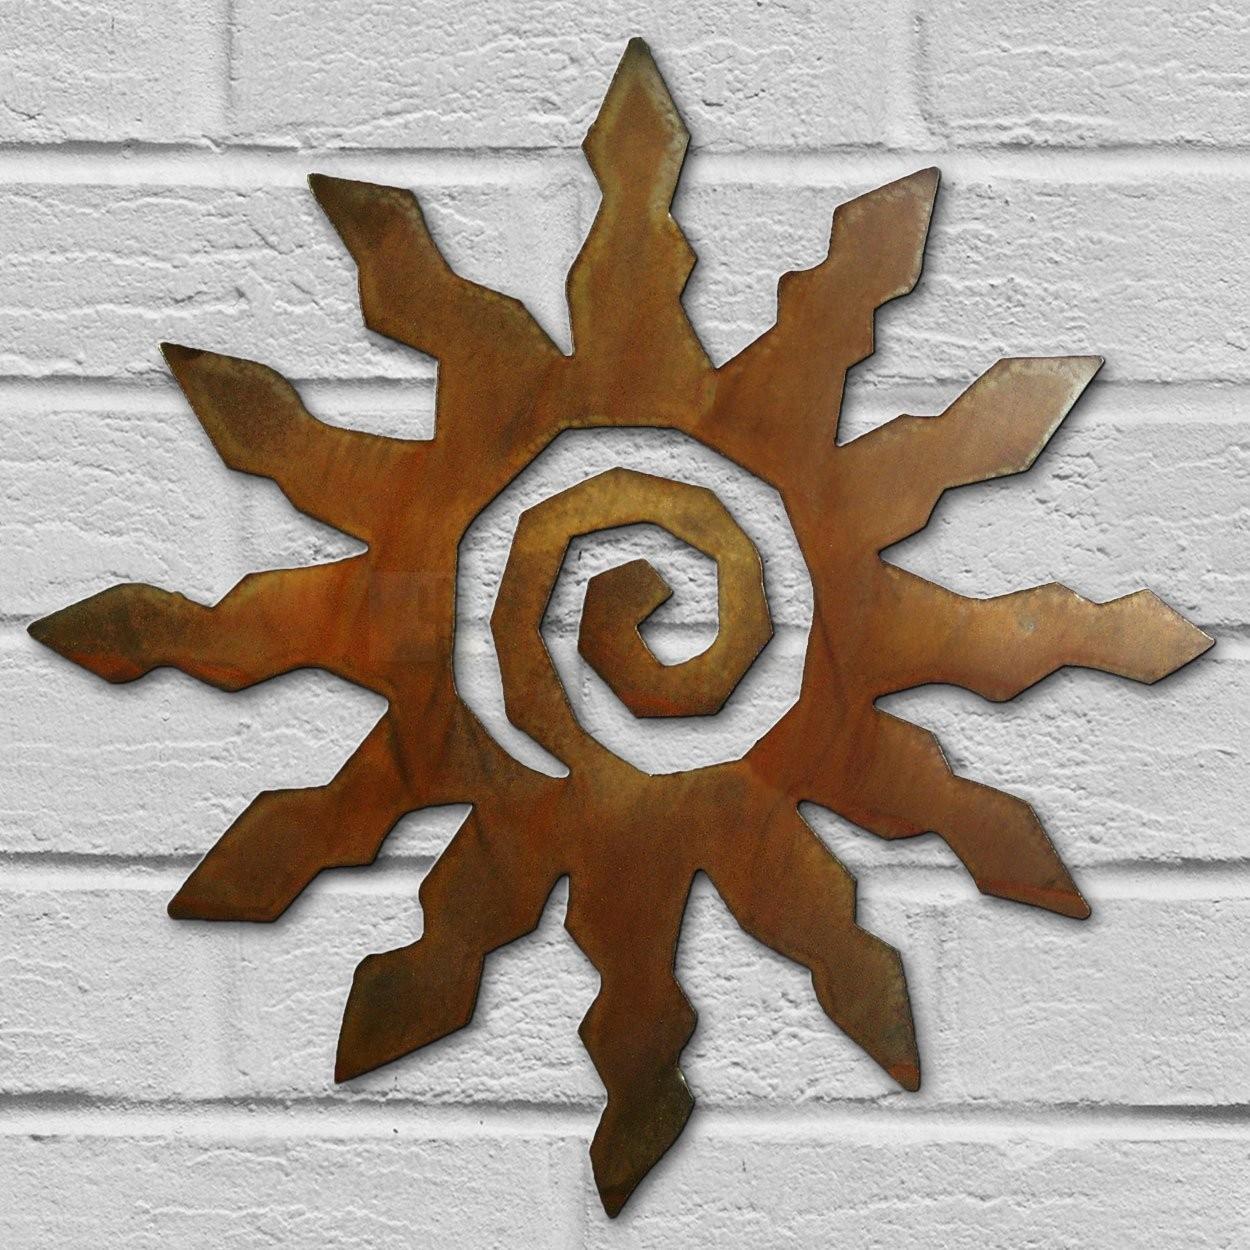 12In Small 12 Ray Spiral Sun 3D Metal Wall Art In Rust Finish – Southwest  Decor Regarding Brown Metal Tribal Arrow Wall Decor (Gallery 29 of 30)